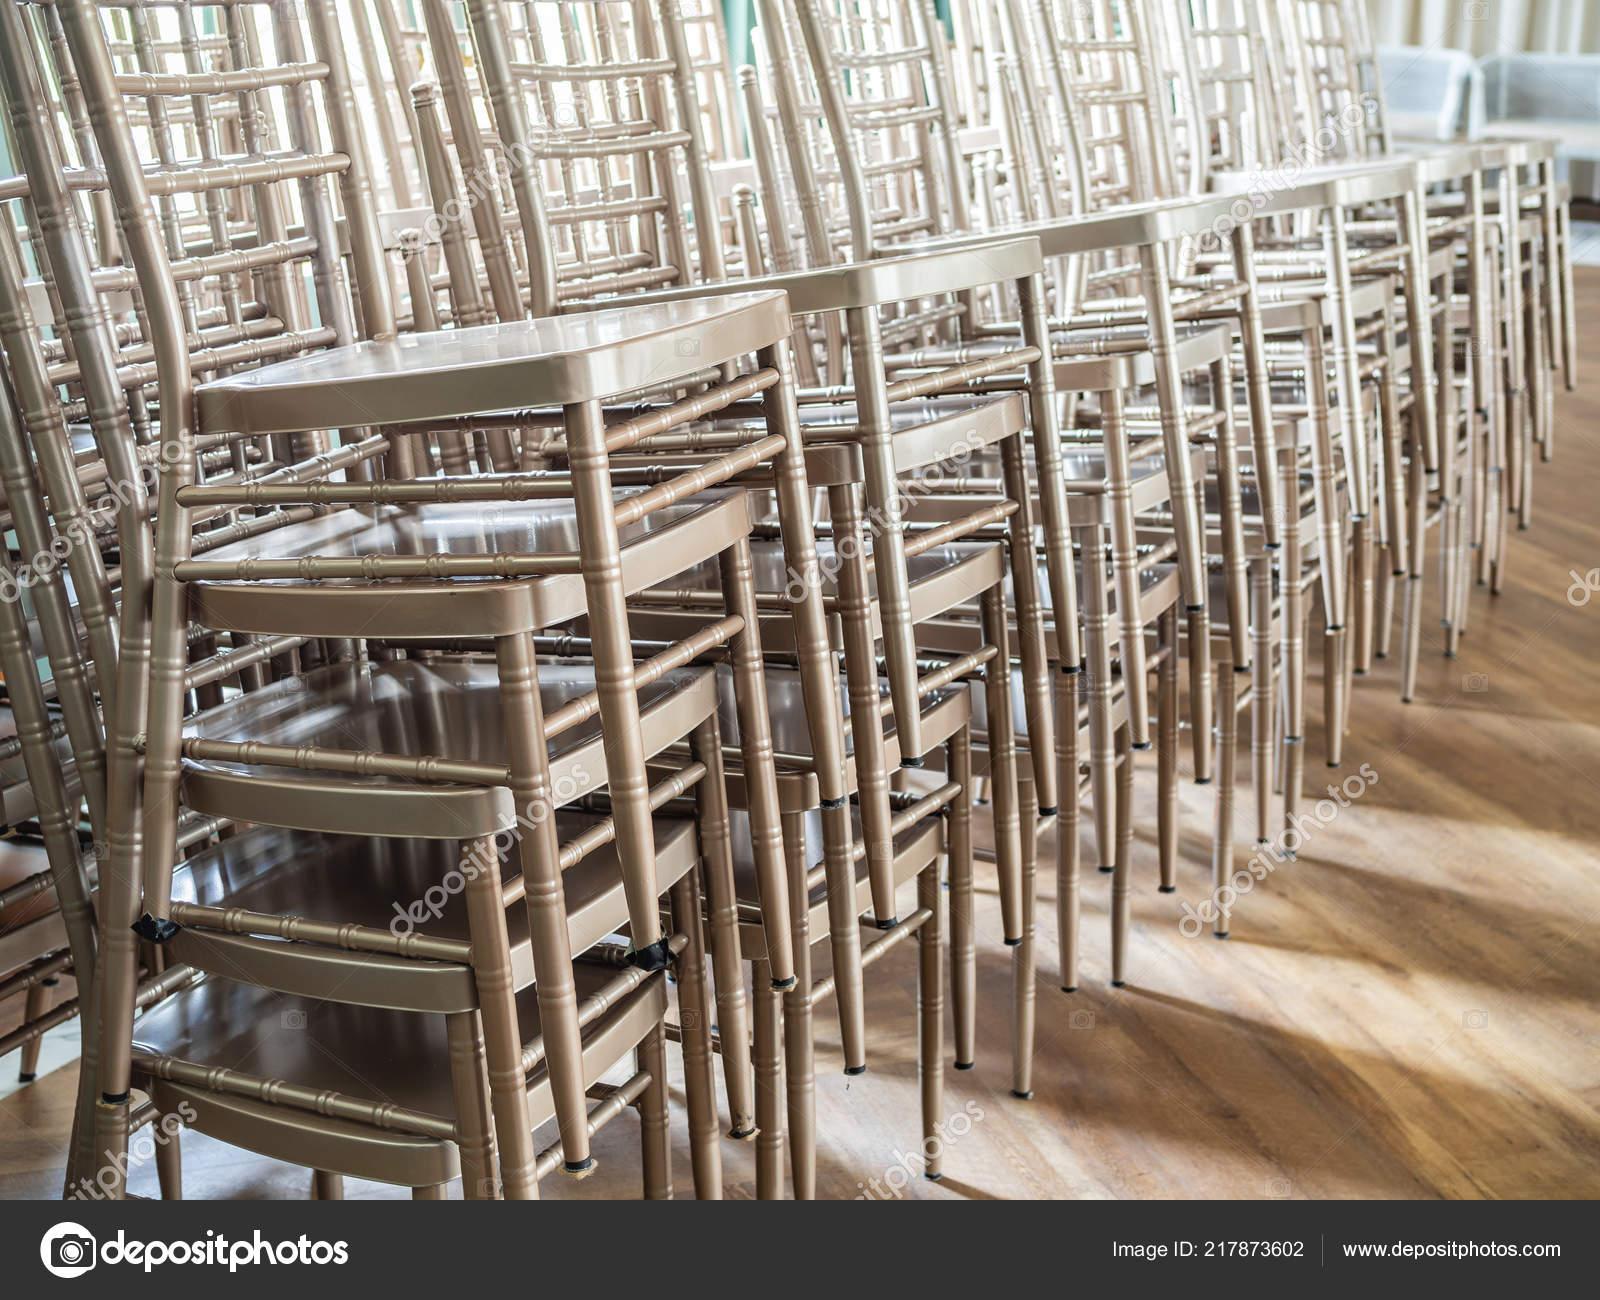 Stupendous Rows Modern Stacked Silver Chairs Wooden Floor Light Window Machost Co Dining Chair Design Ideas Machostcouk